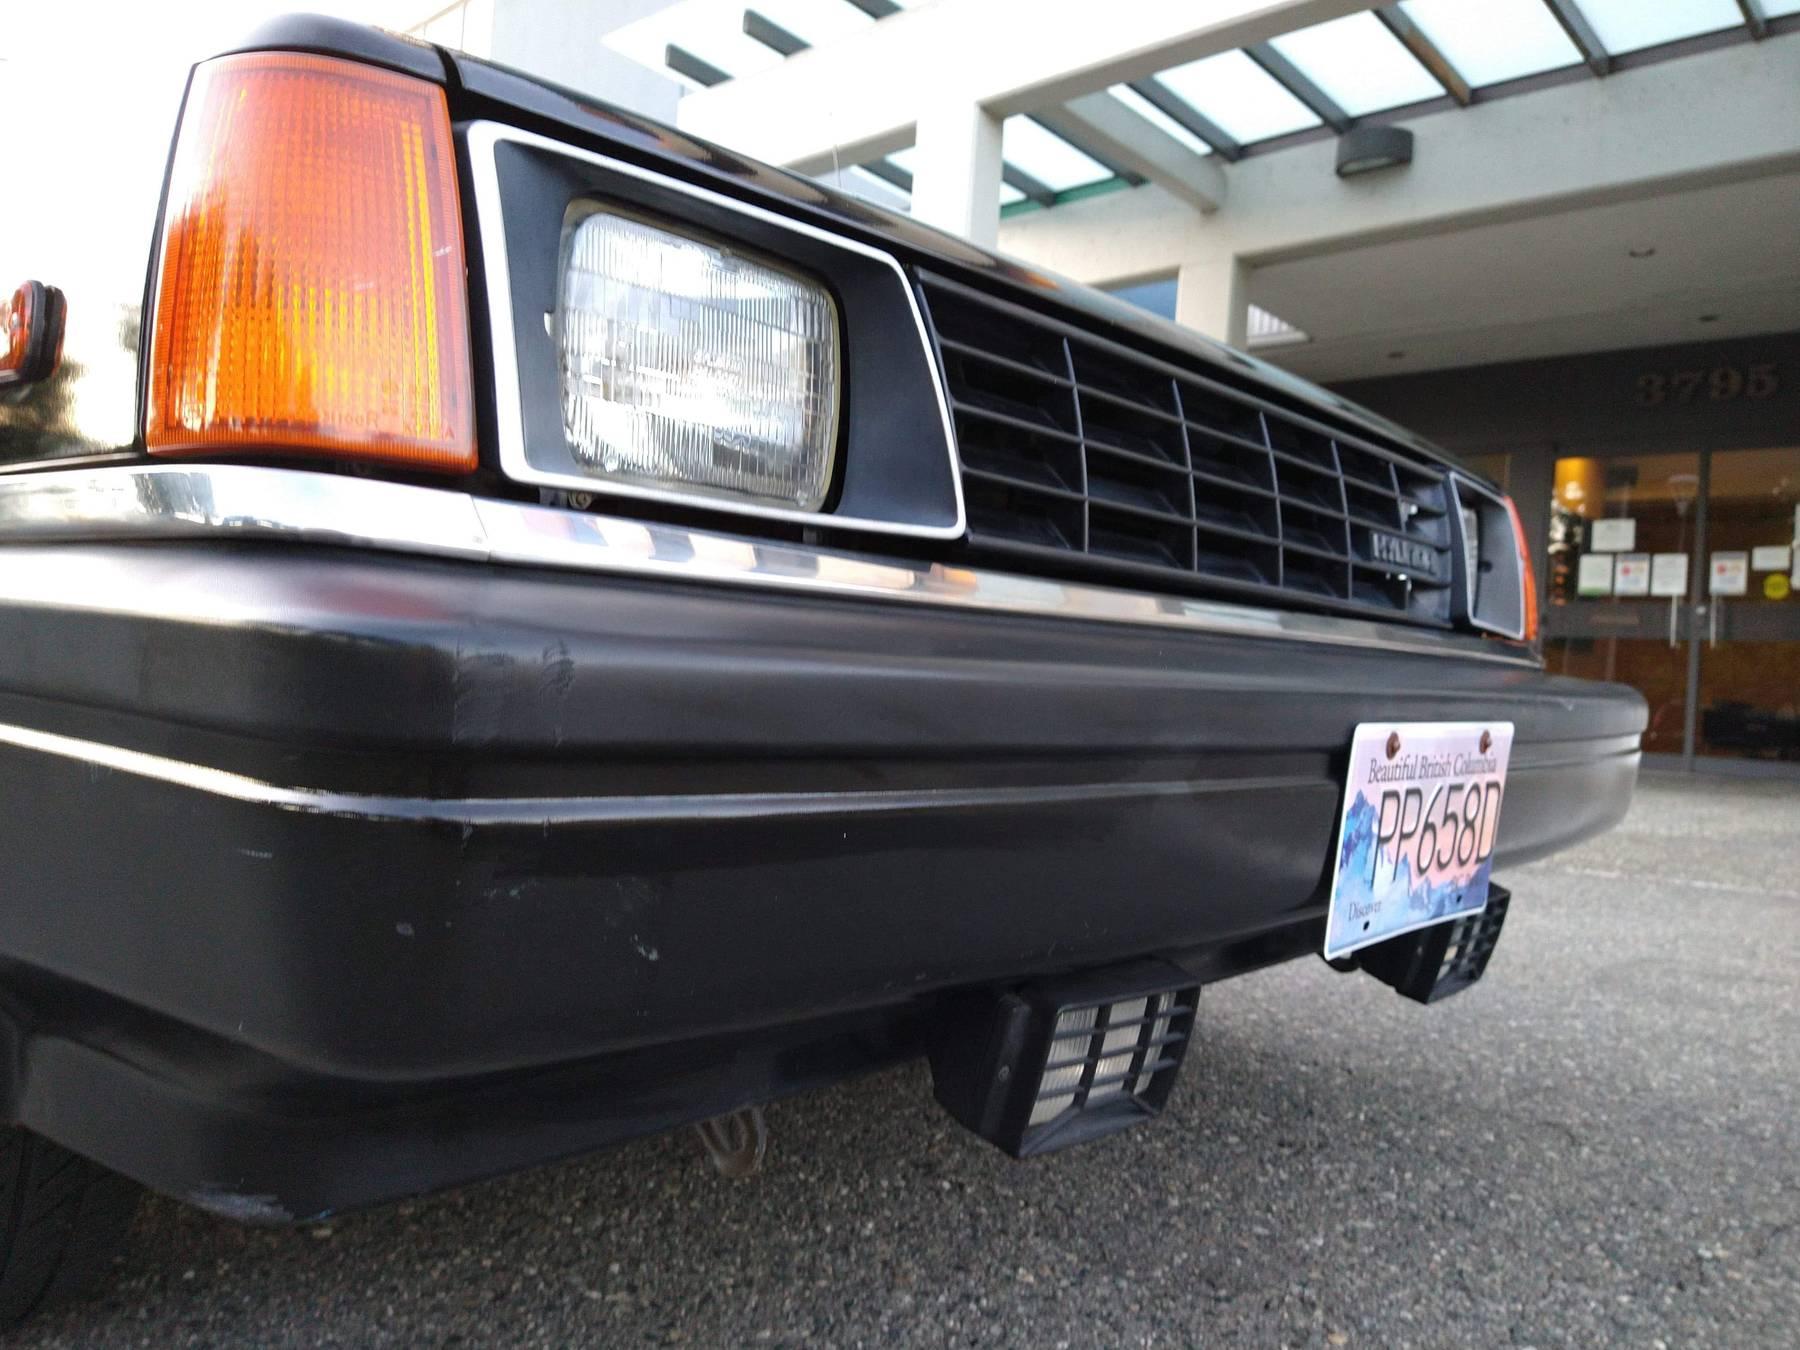 1986 Hyundai Stellar Executive front